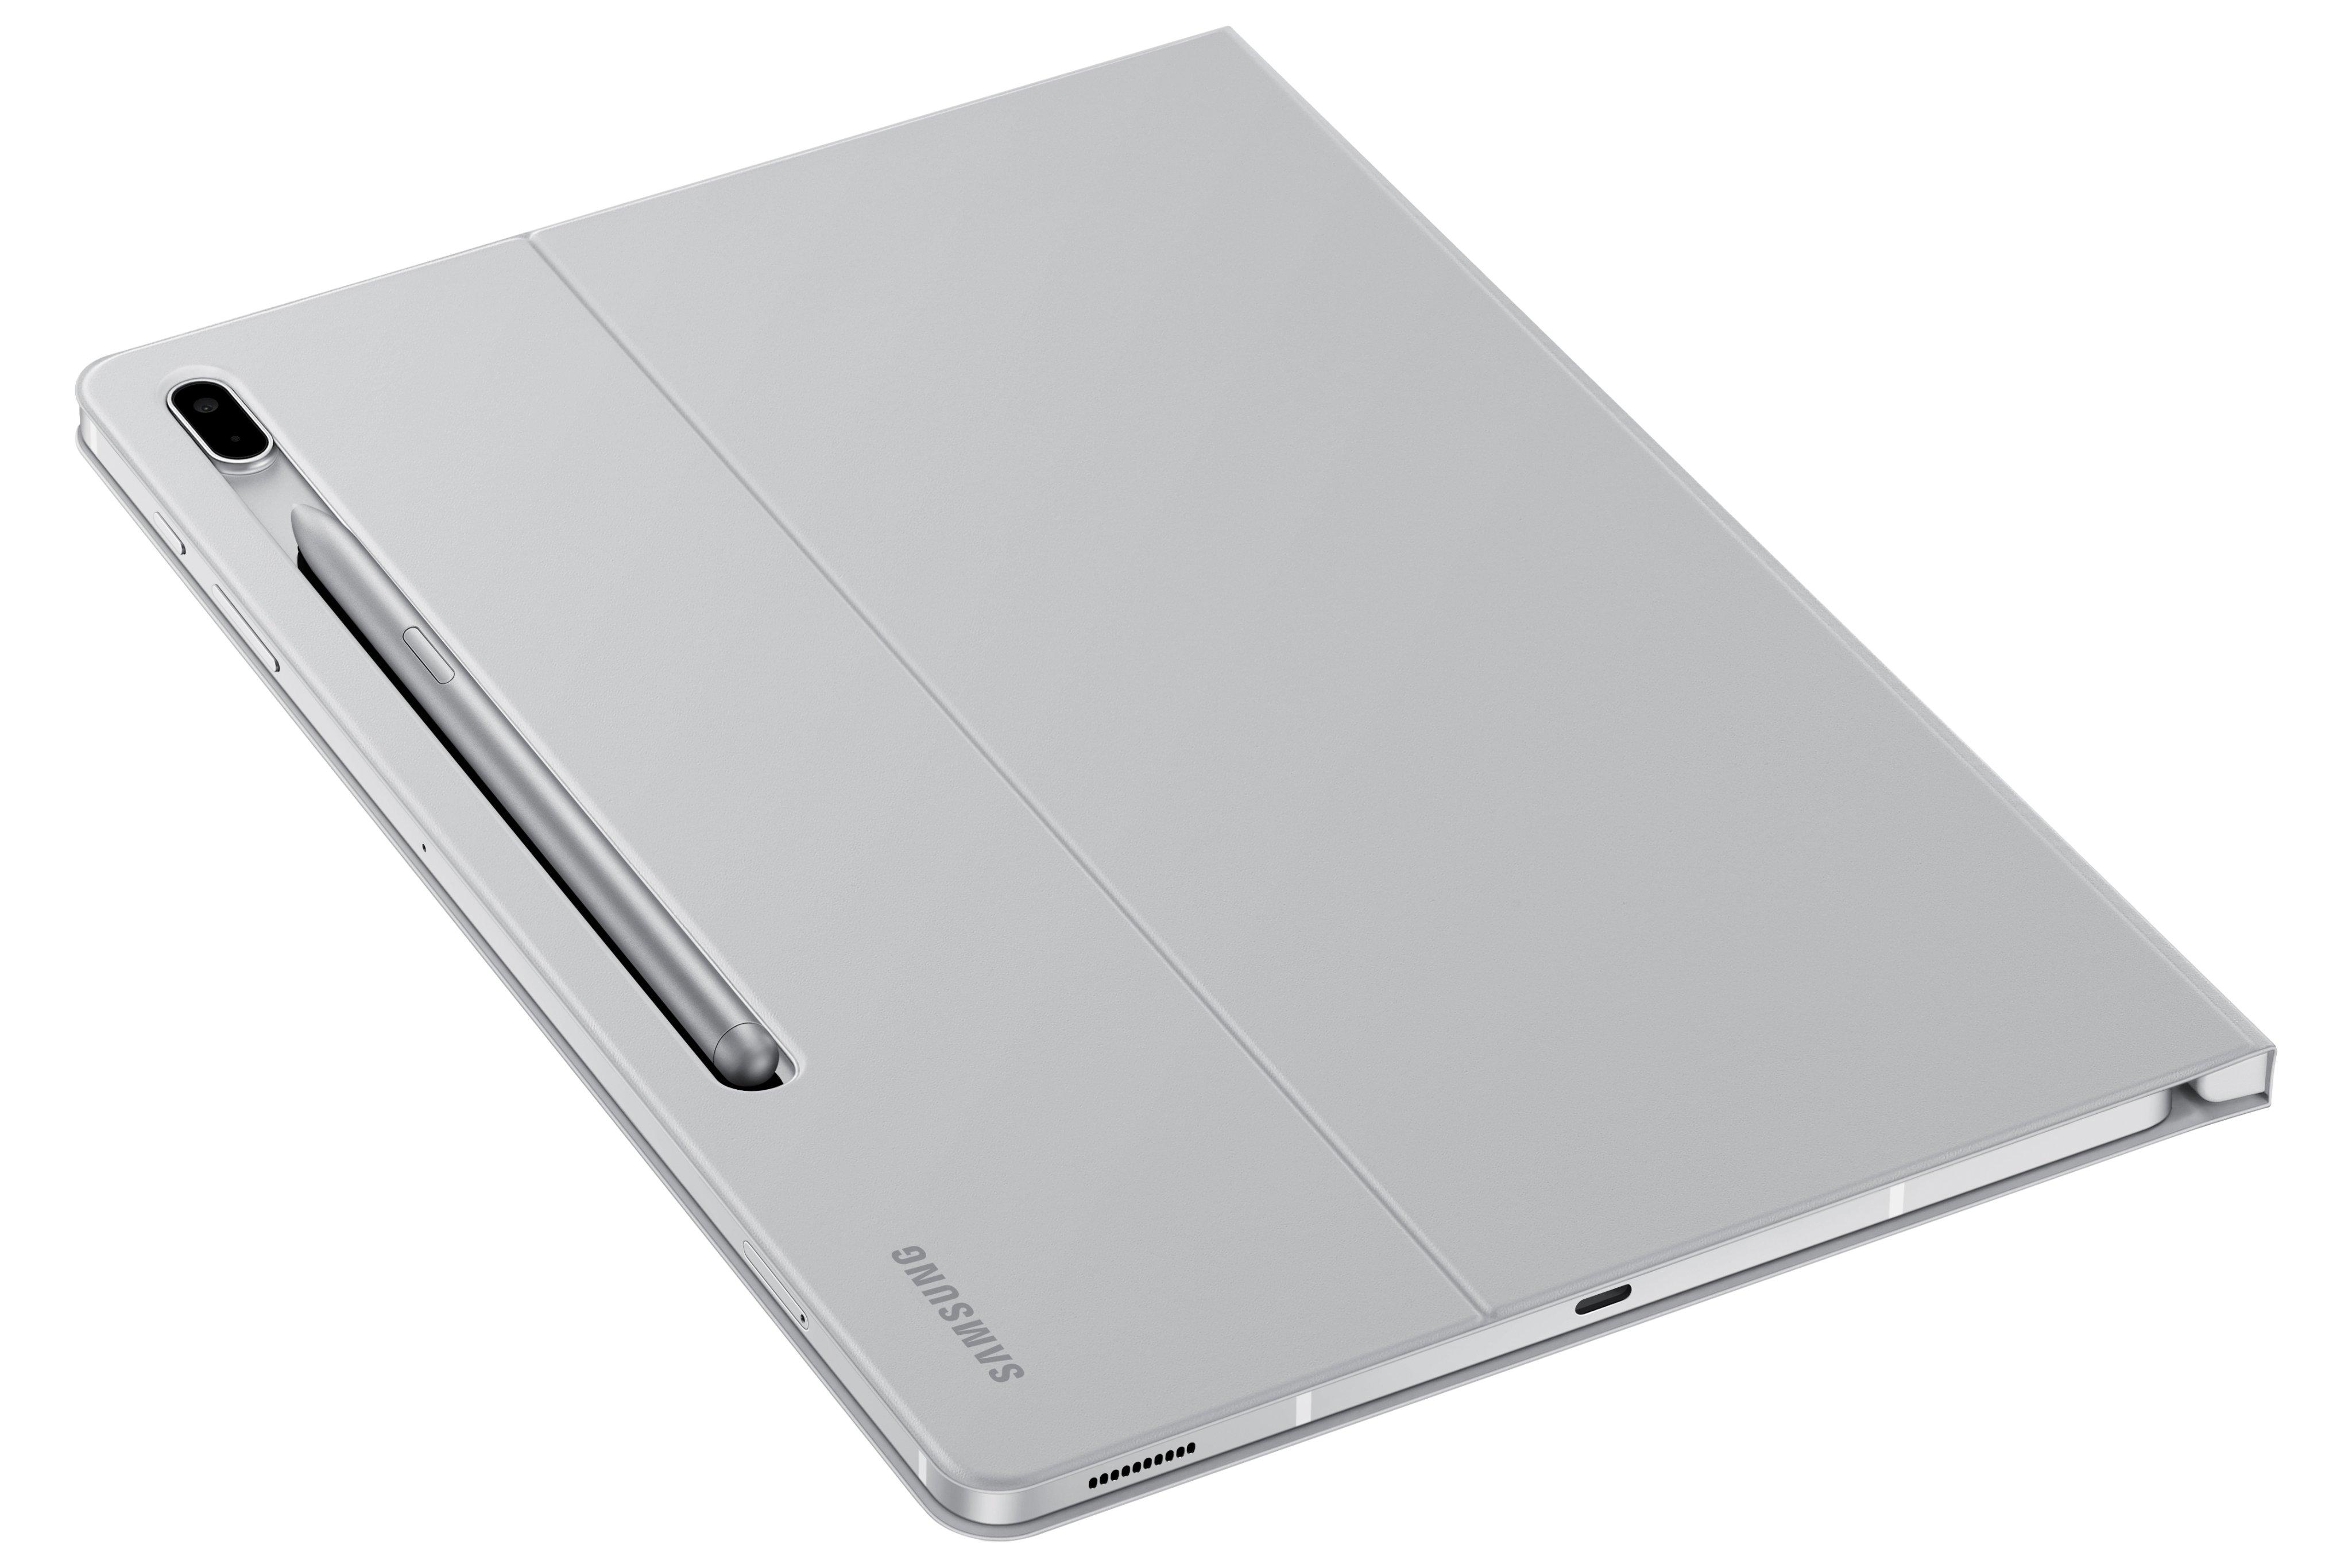 Samsung Galaxy Tab S7+ Lite в четырёх новых цветах Samsung  - samsung_galaxy_tab_s7_lite_vo_vseh_cvetah_i_rakursah_na_press_foto_picture8_7